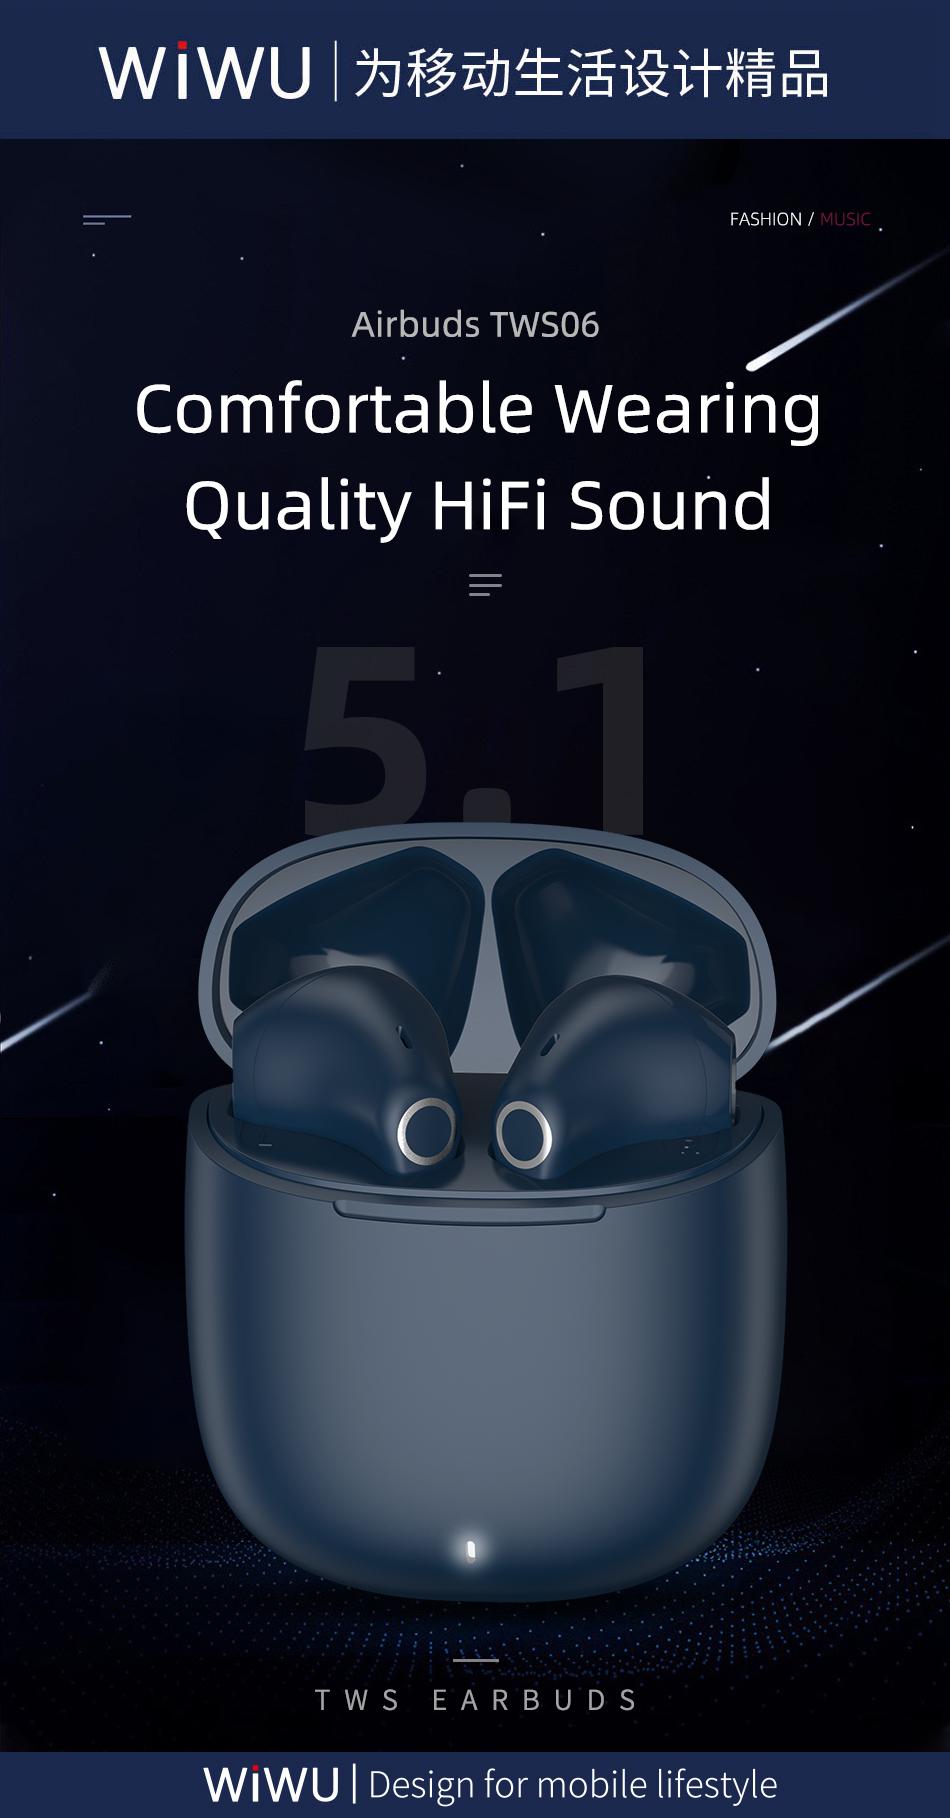 WiWU TWS06真无线双耳 蓝牙耳机 (https://www.wiwu.net.cn/) 耳机 第1张